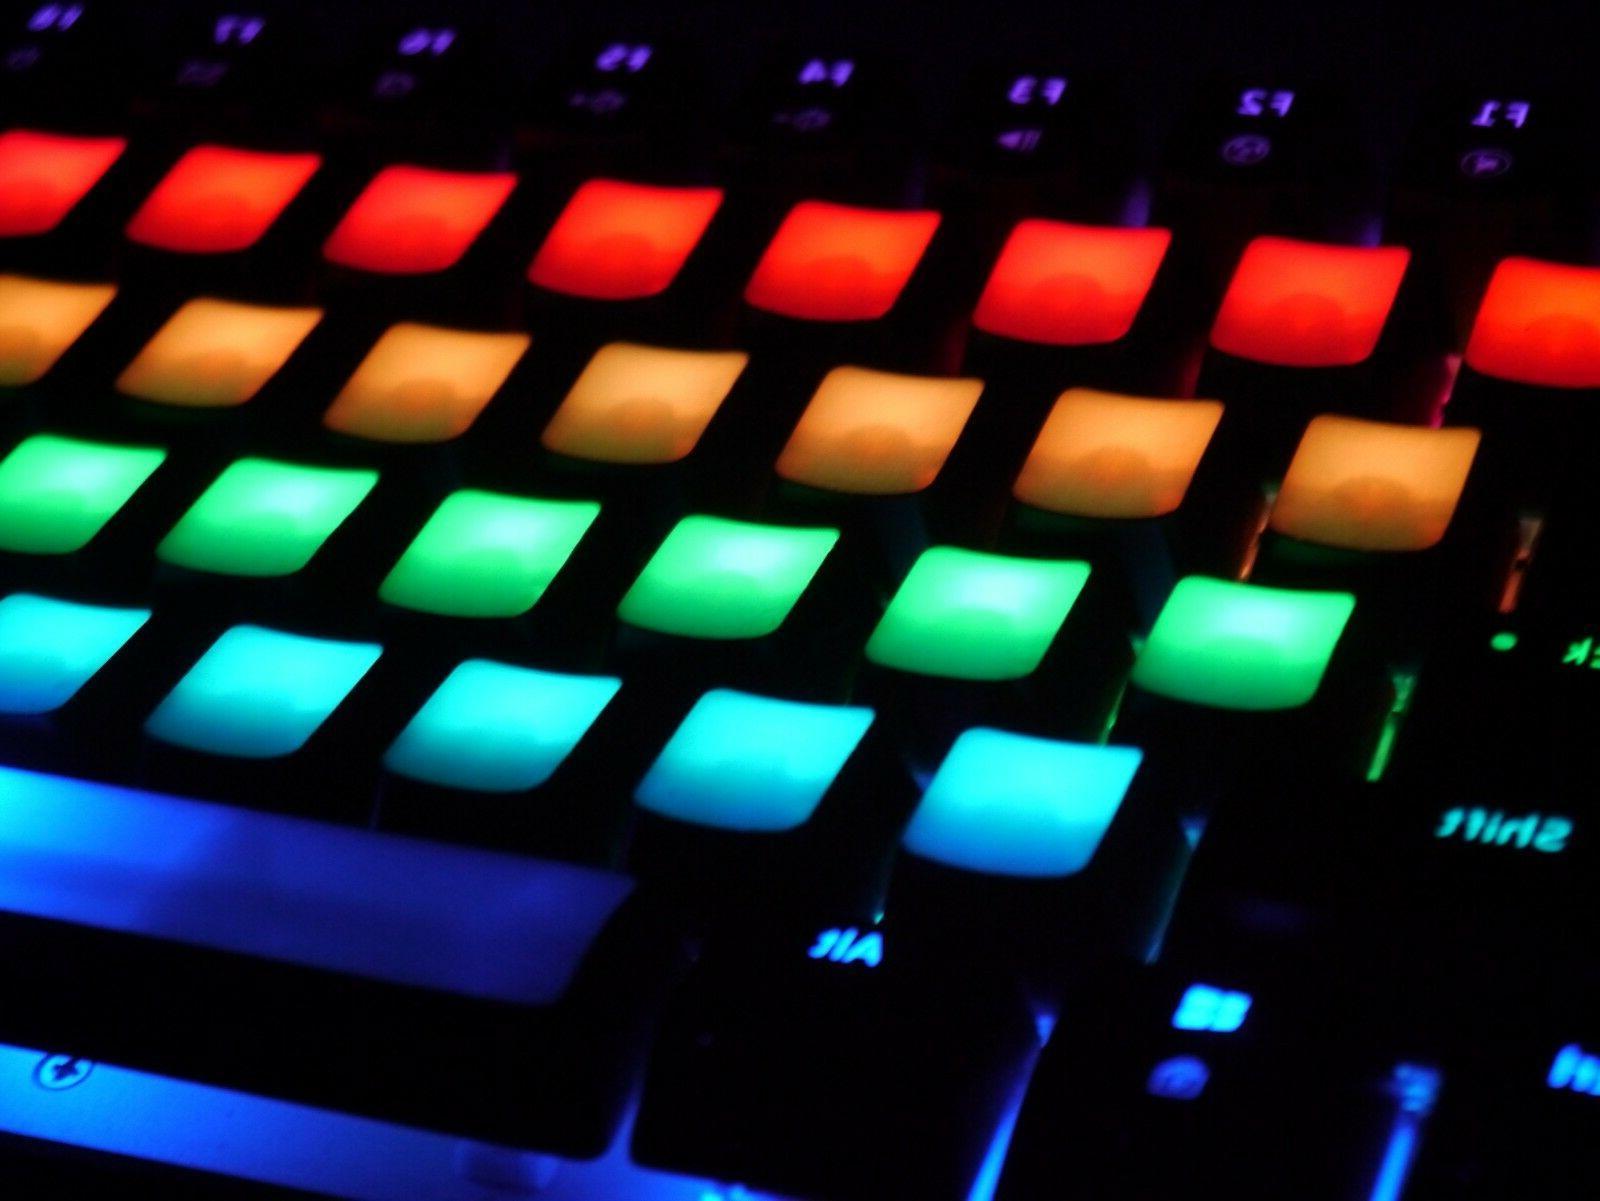 Ajazz AK33 Geek RGB Mech Keyboard , 82 Keys, Decals